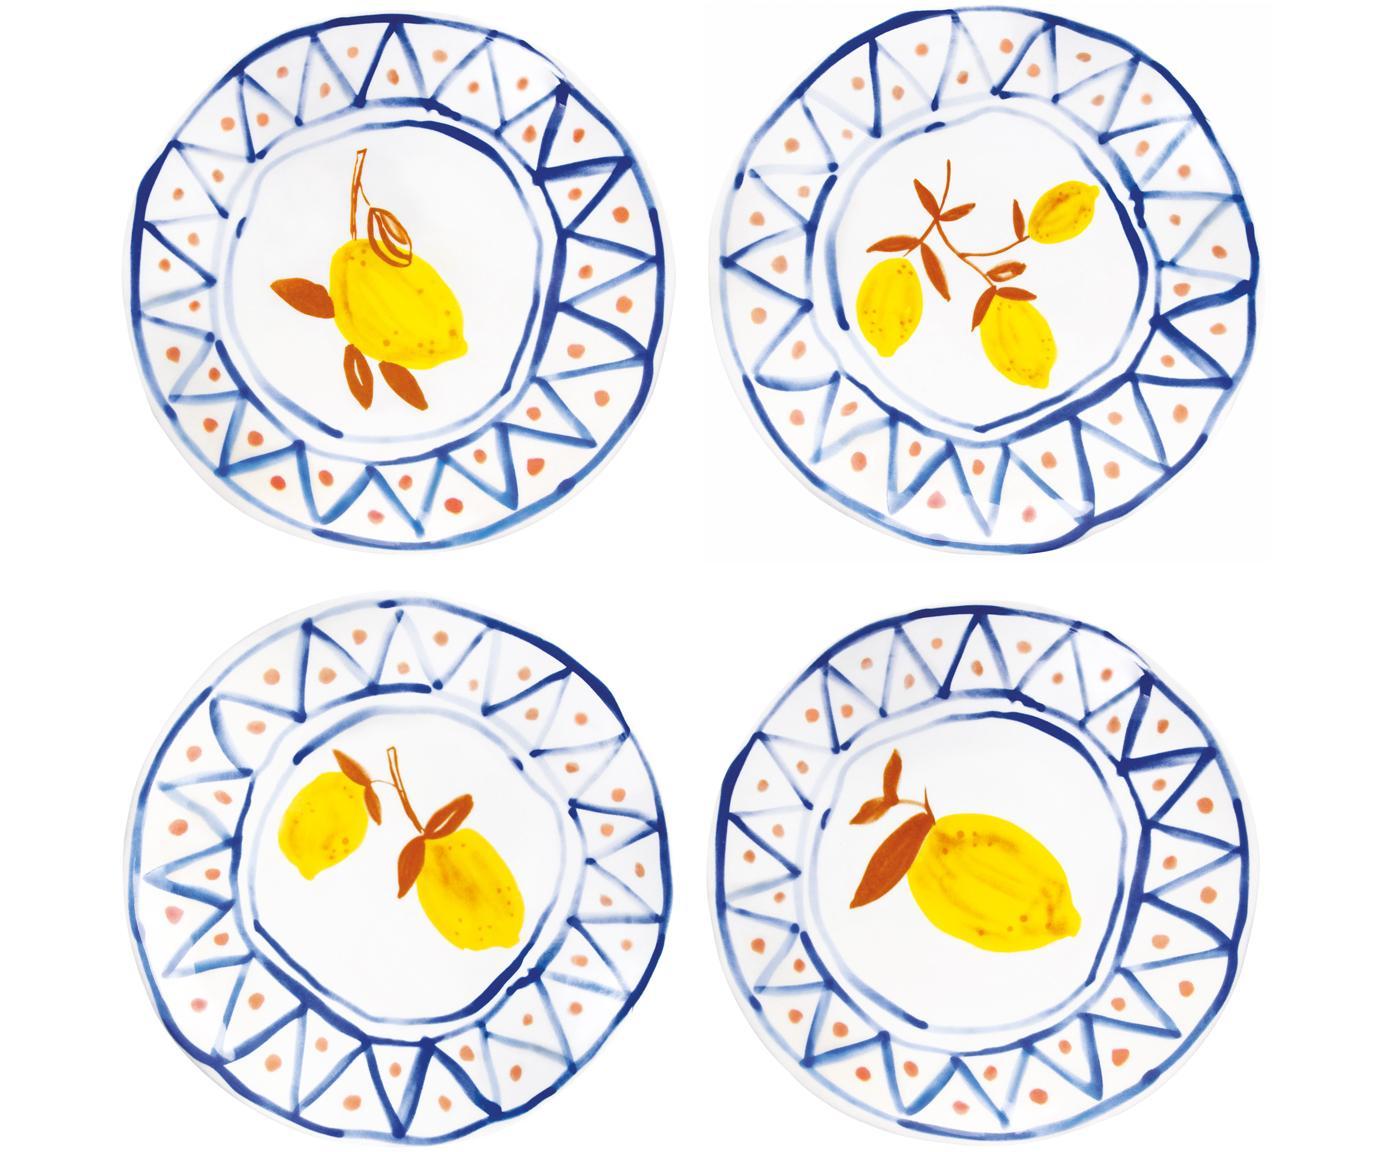 Set 4 piatti per pane Lemon Moroccan, Terracotta, Bianco, blu, arancione, giallo, Ø 16 cm